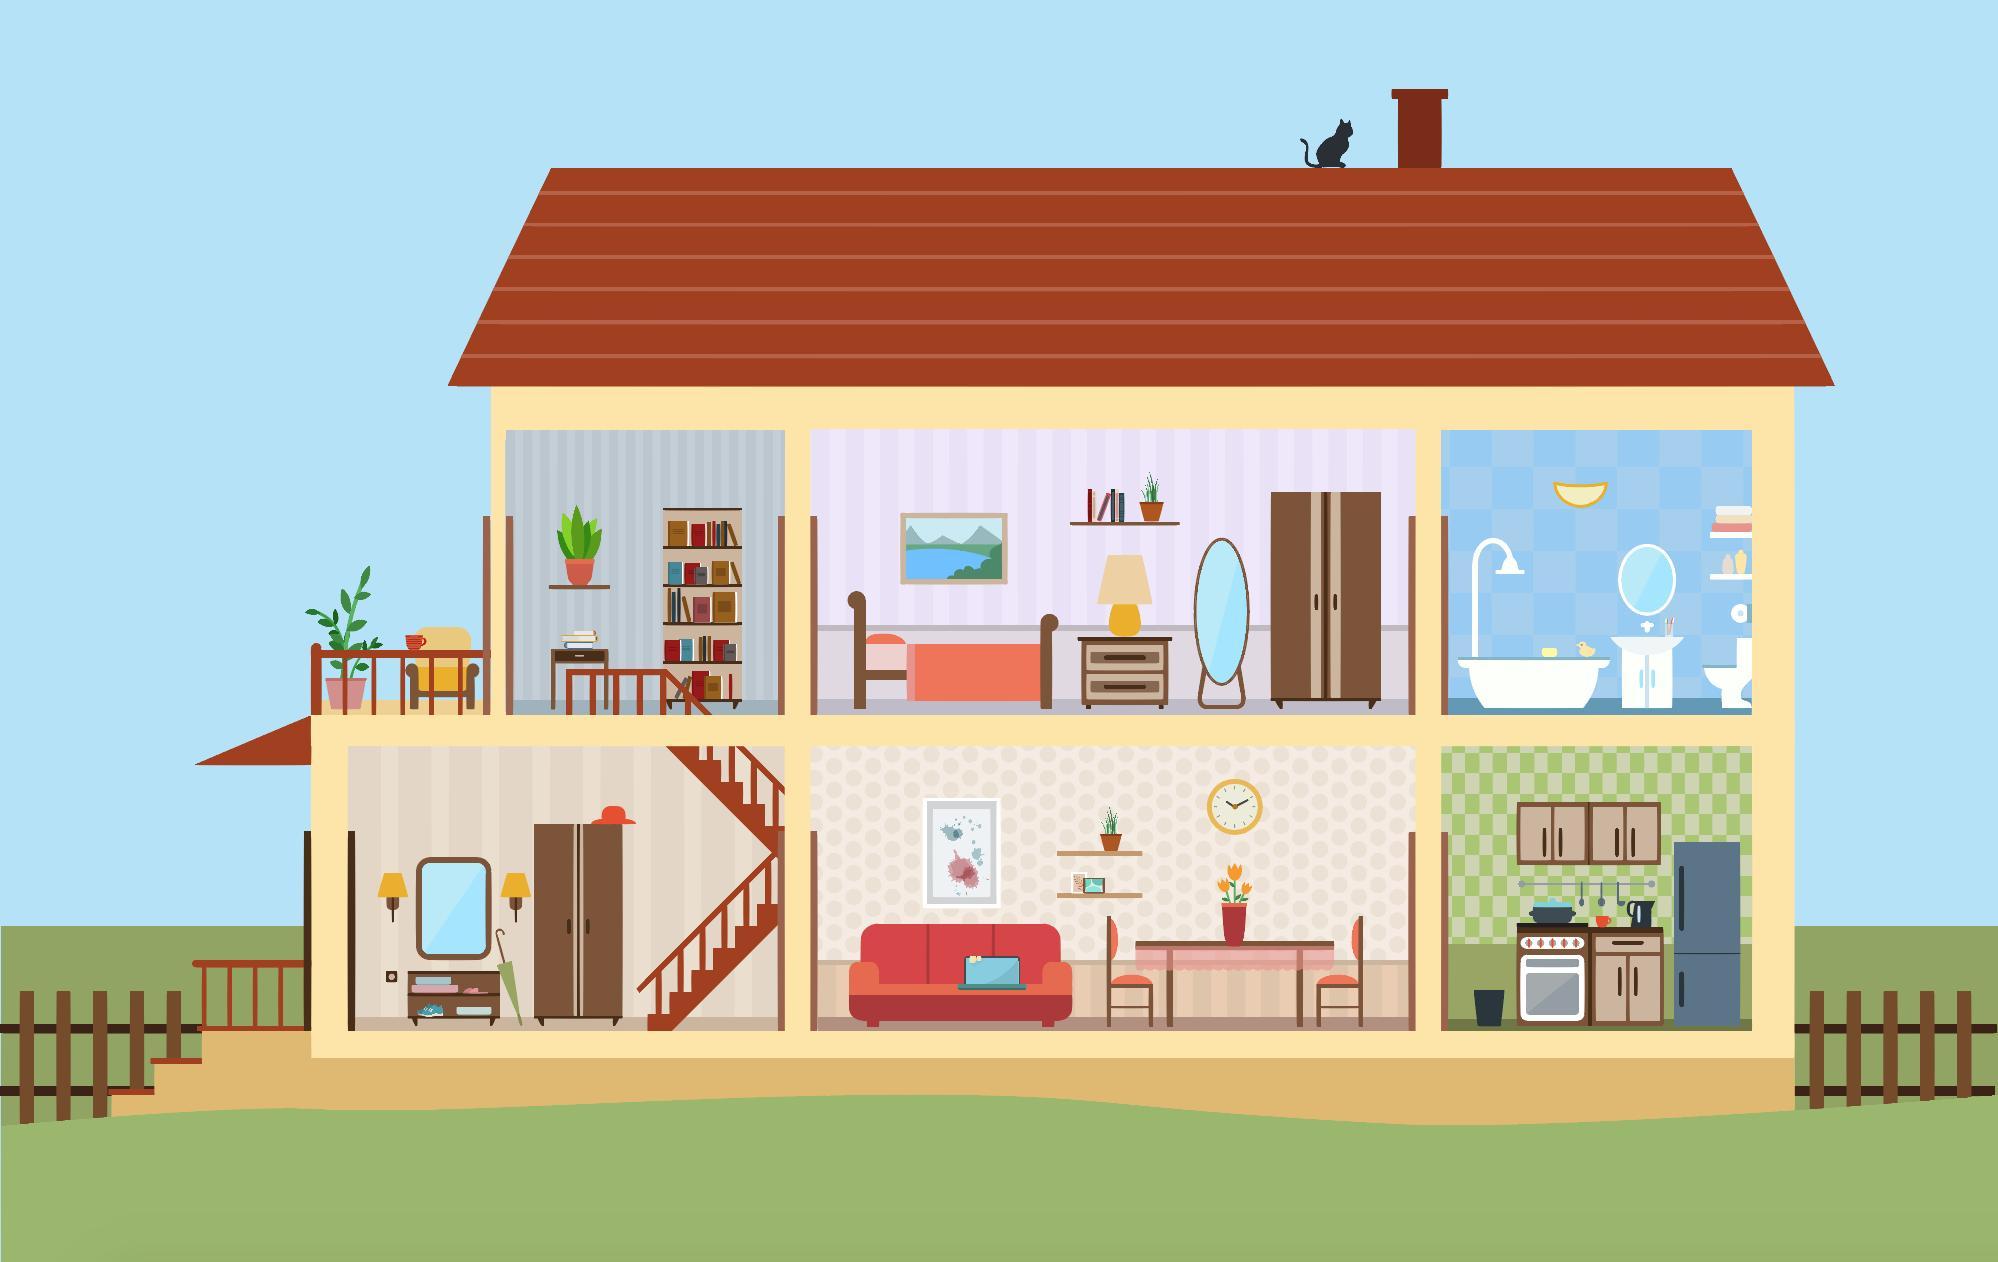 Картинка дом с комнатами в разрезе